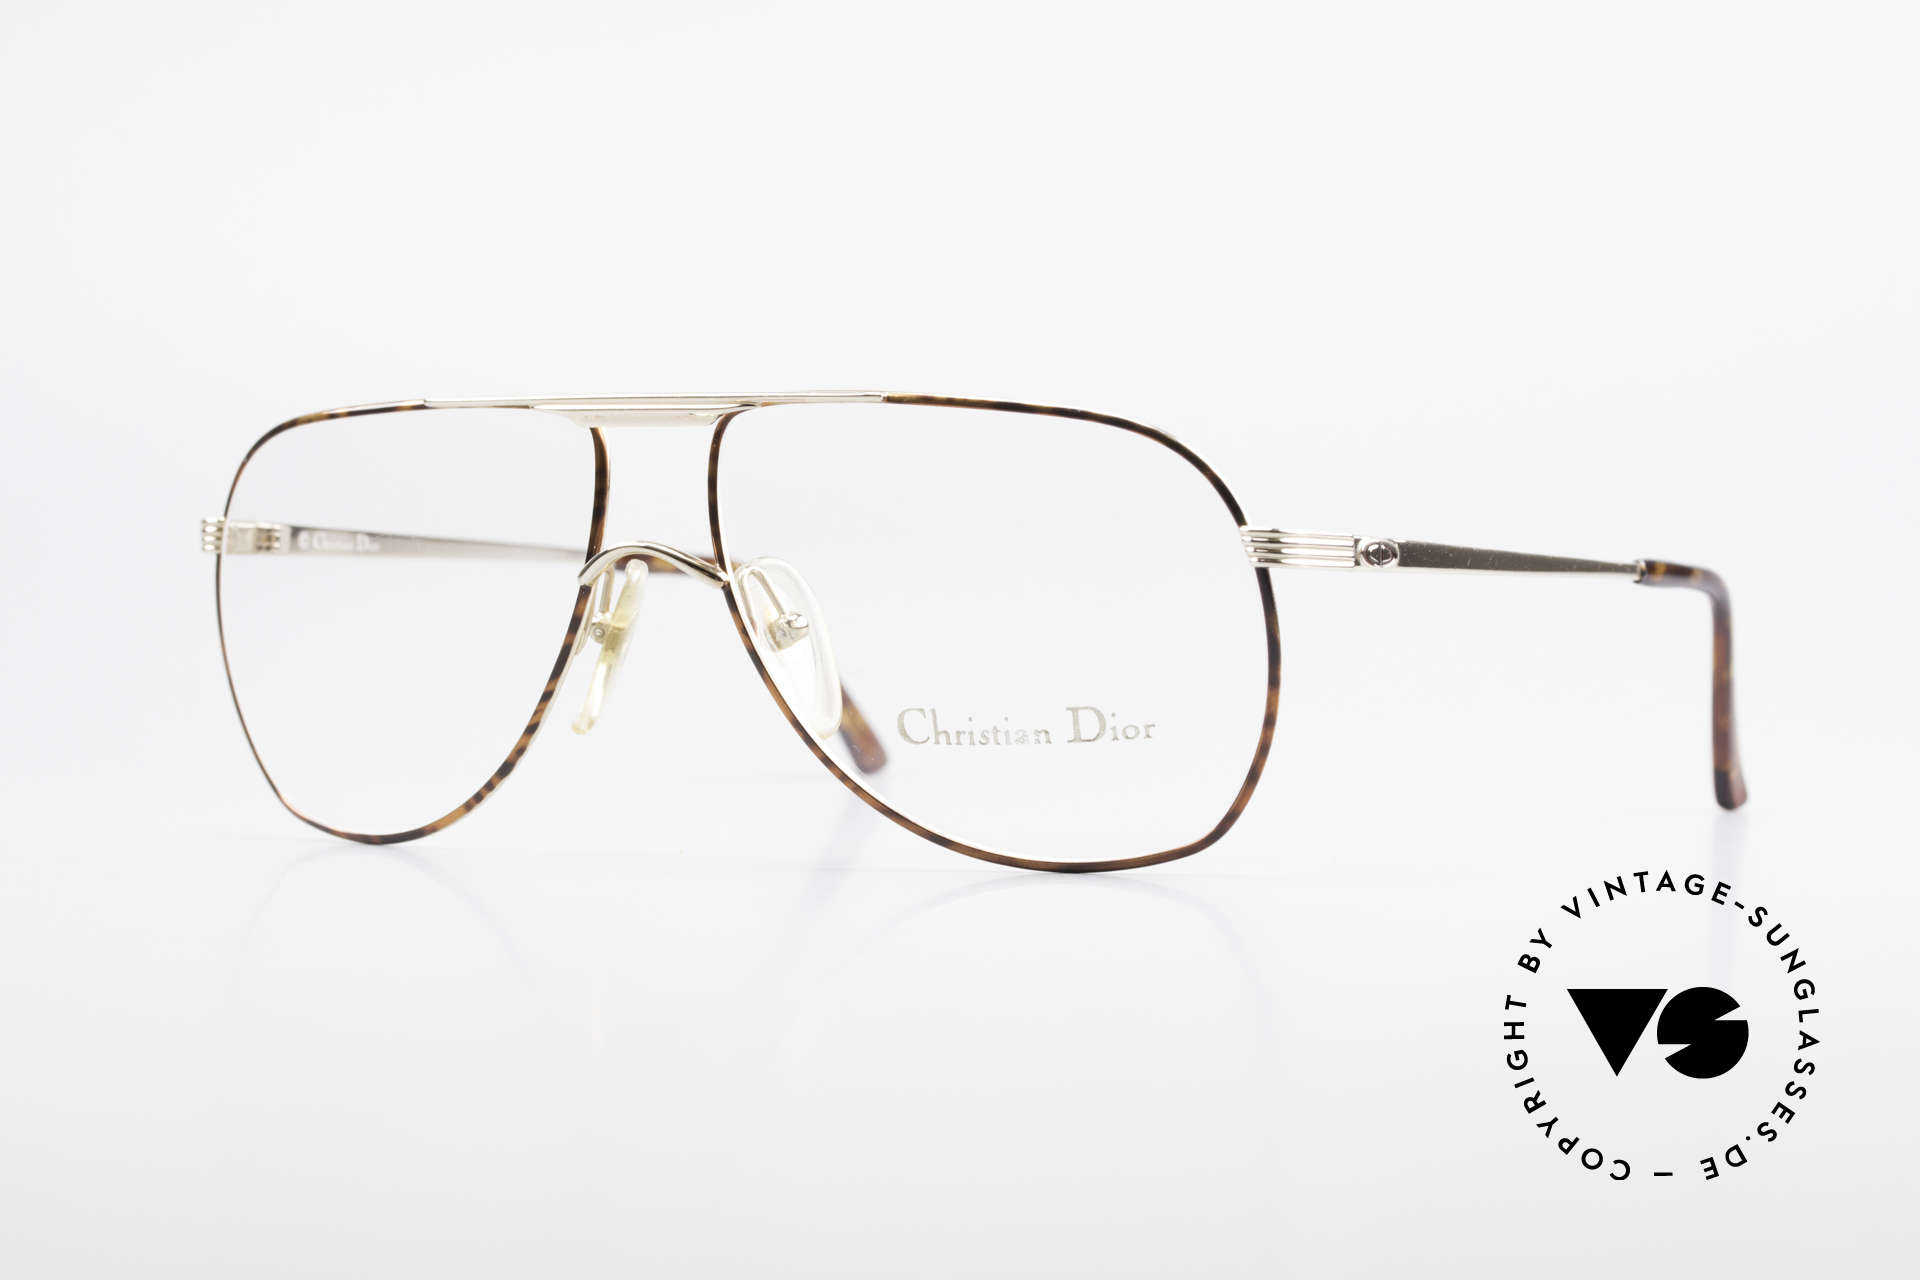 Christian Dior 2553 Vintage Glasses Aviator Style, awesome aviator eyeglasses by Christian Dior, Made for Men